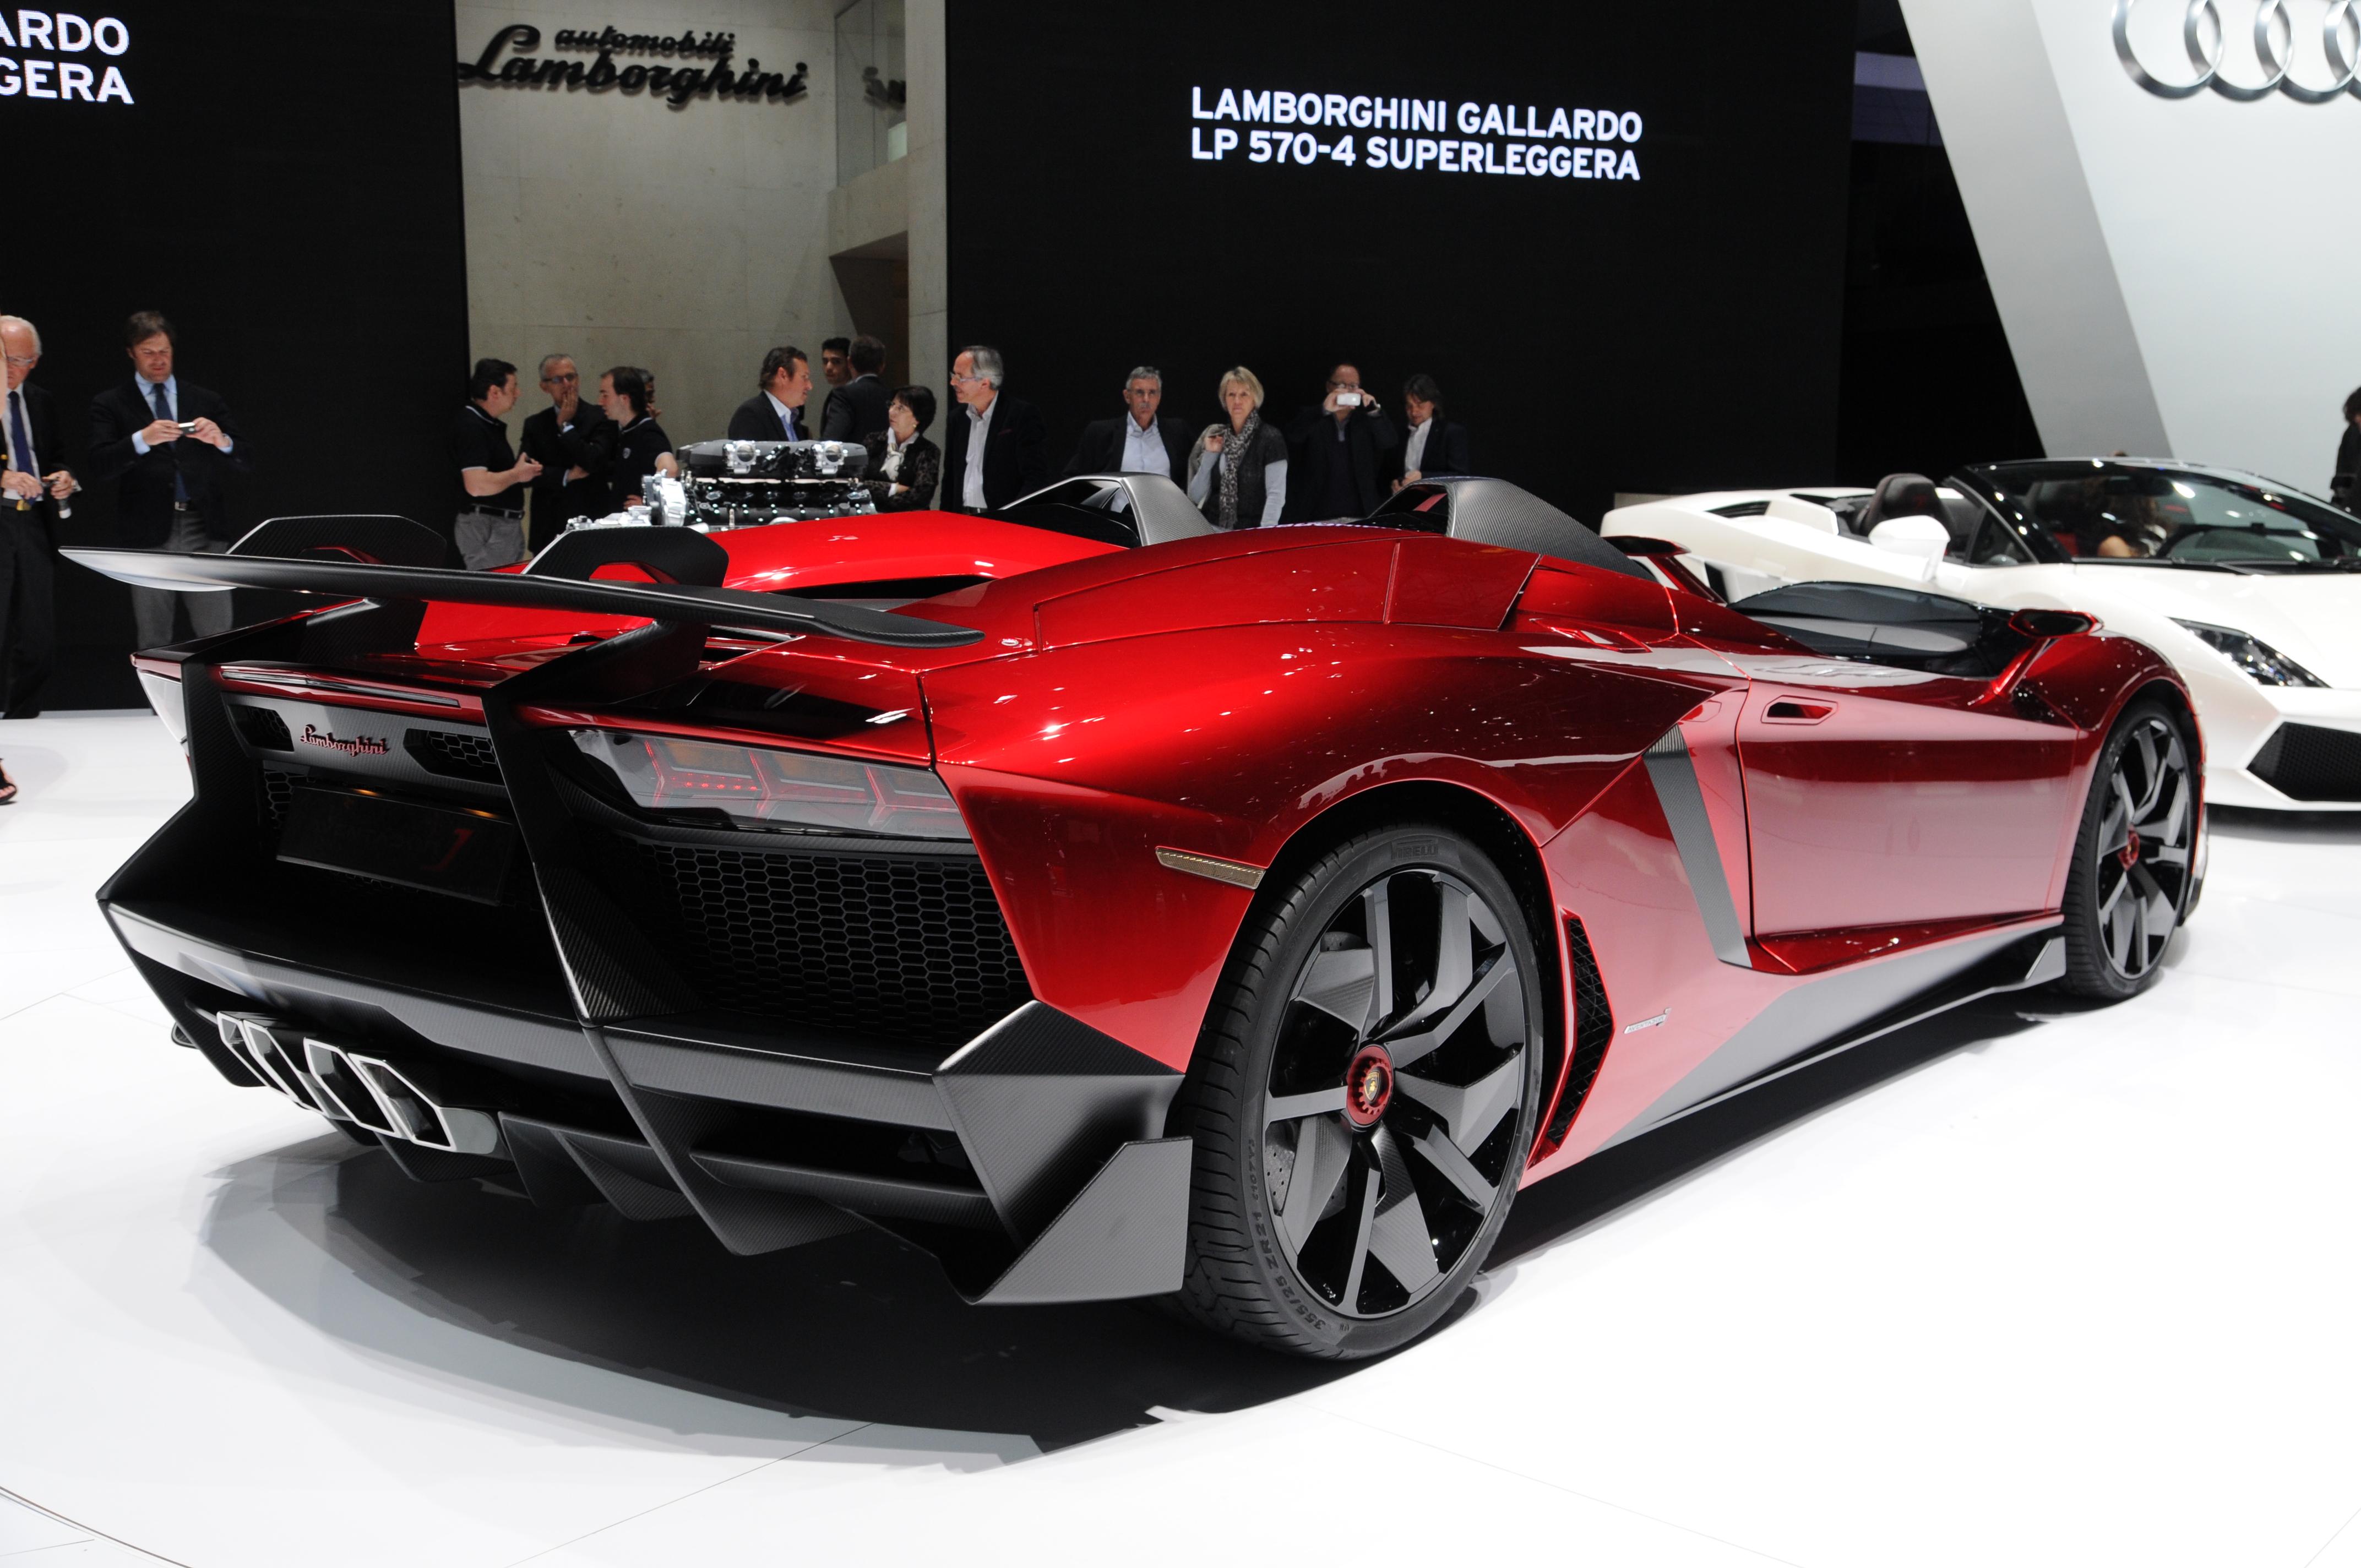 2012-03-07_Motorshow_Geneva_4609 Extraordinary Lamborghini Countach Schwer Zu Fahren Cars Trend